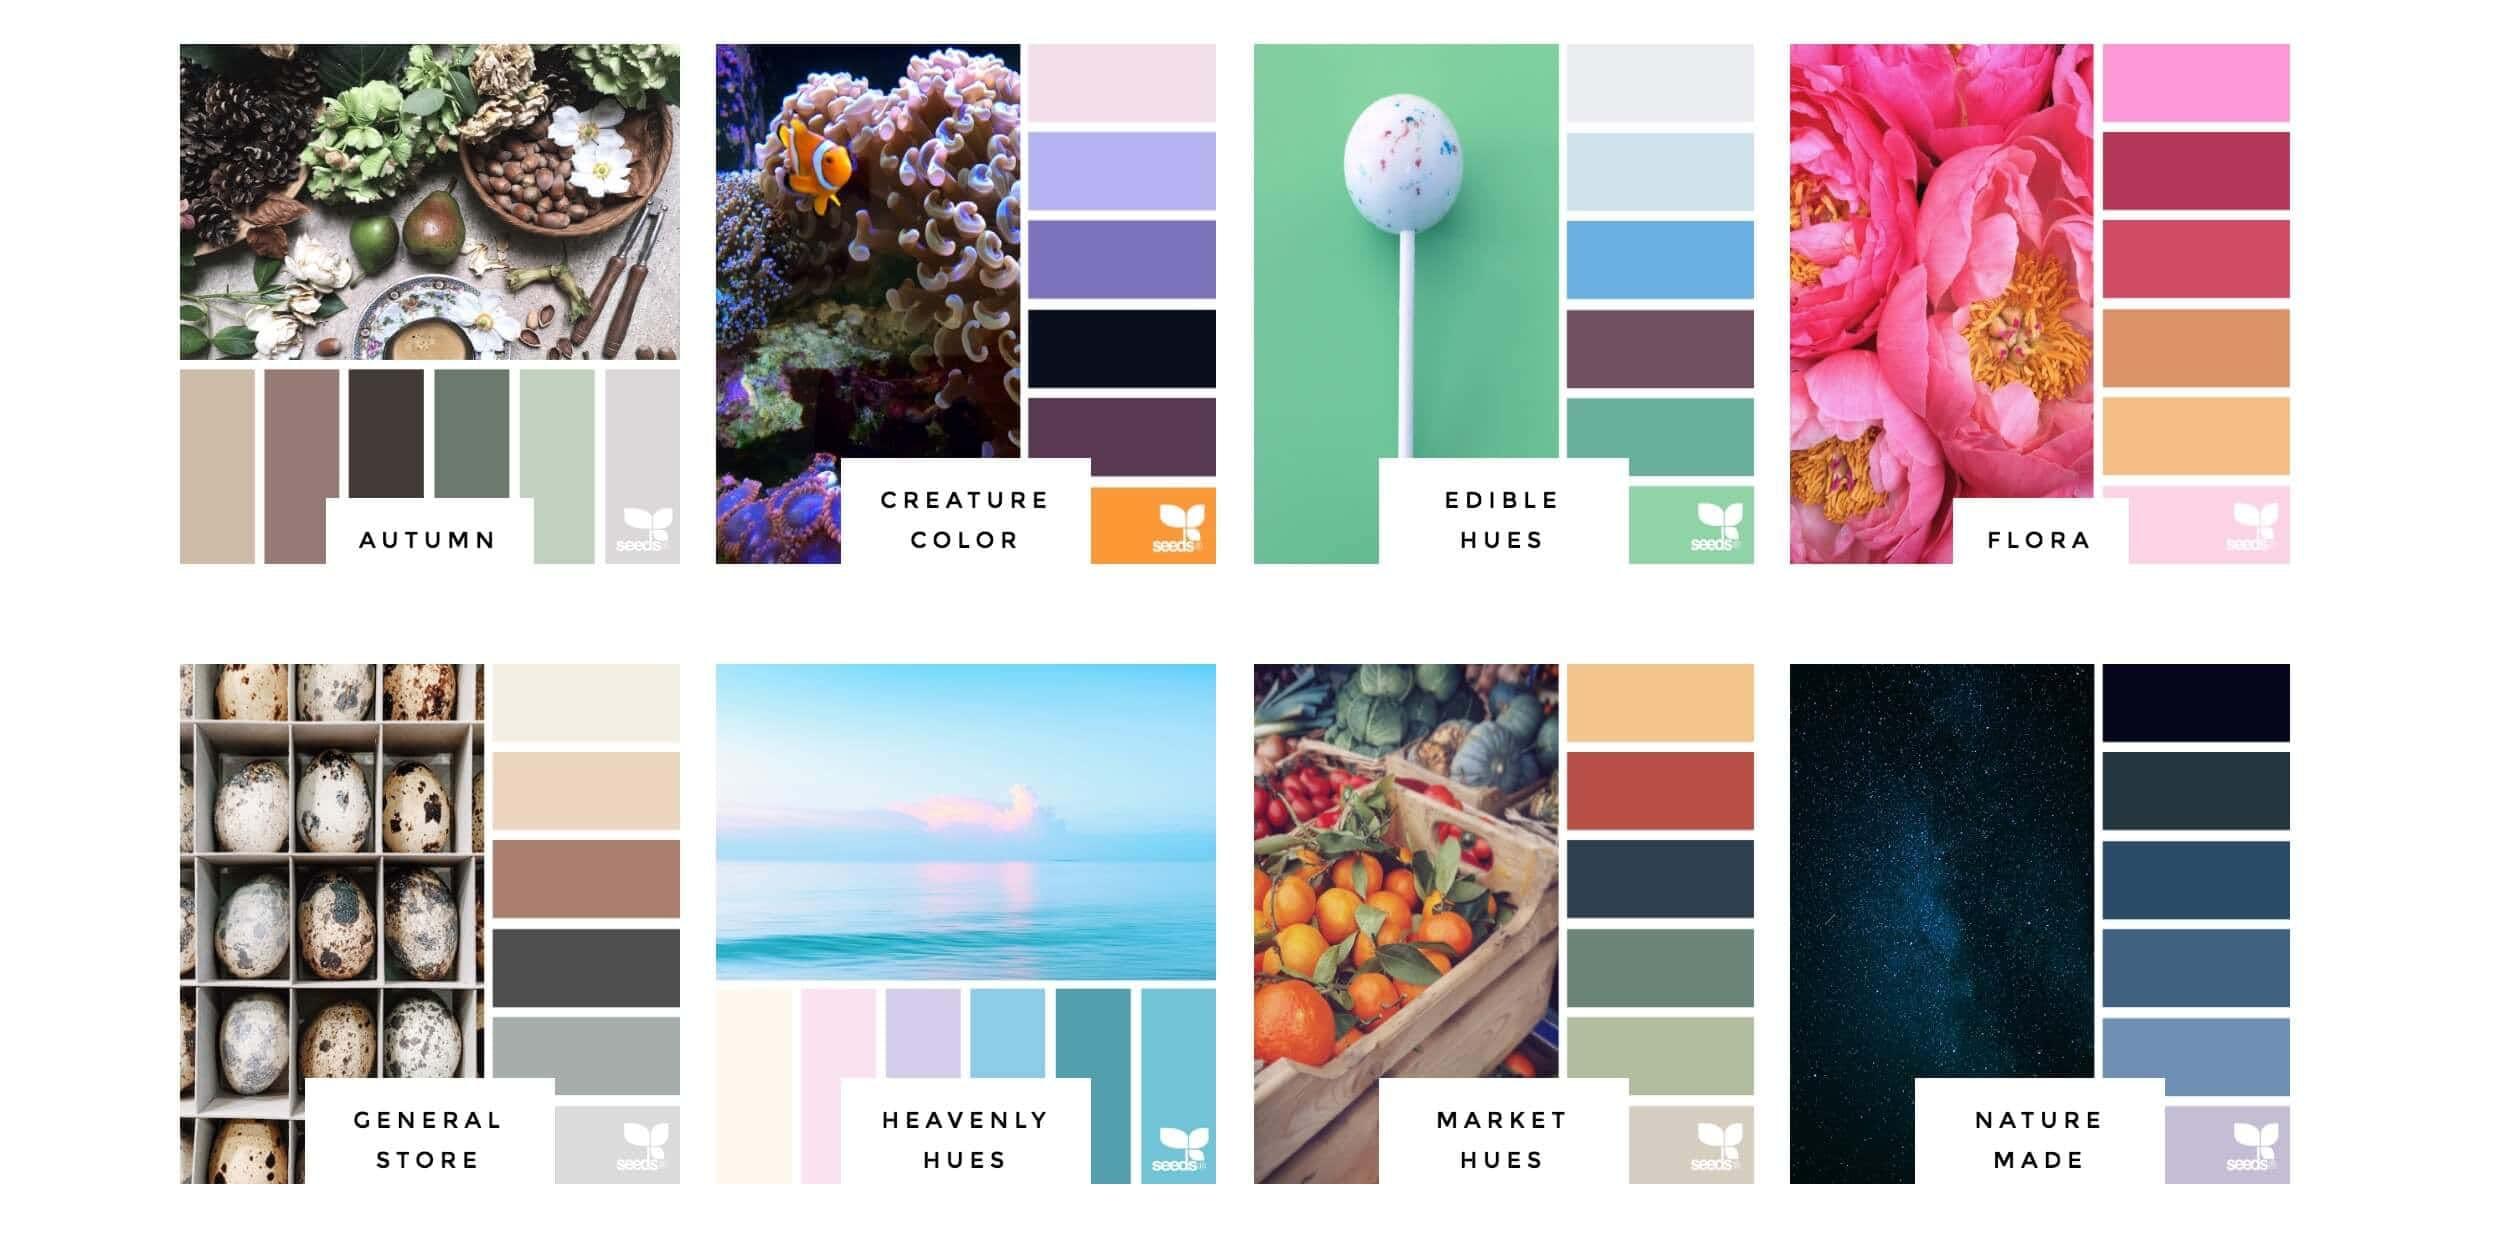 design-seeds-1.jpg